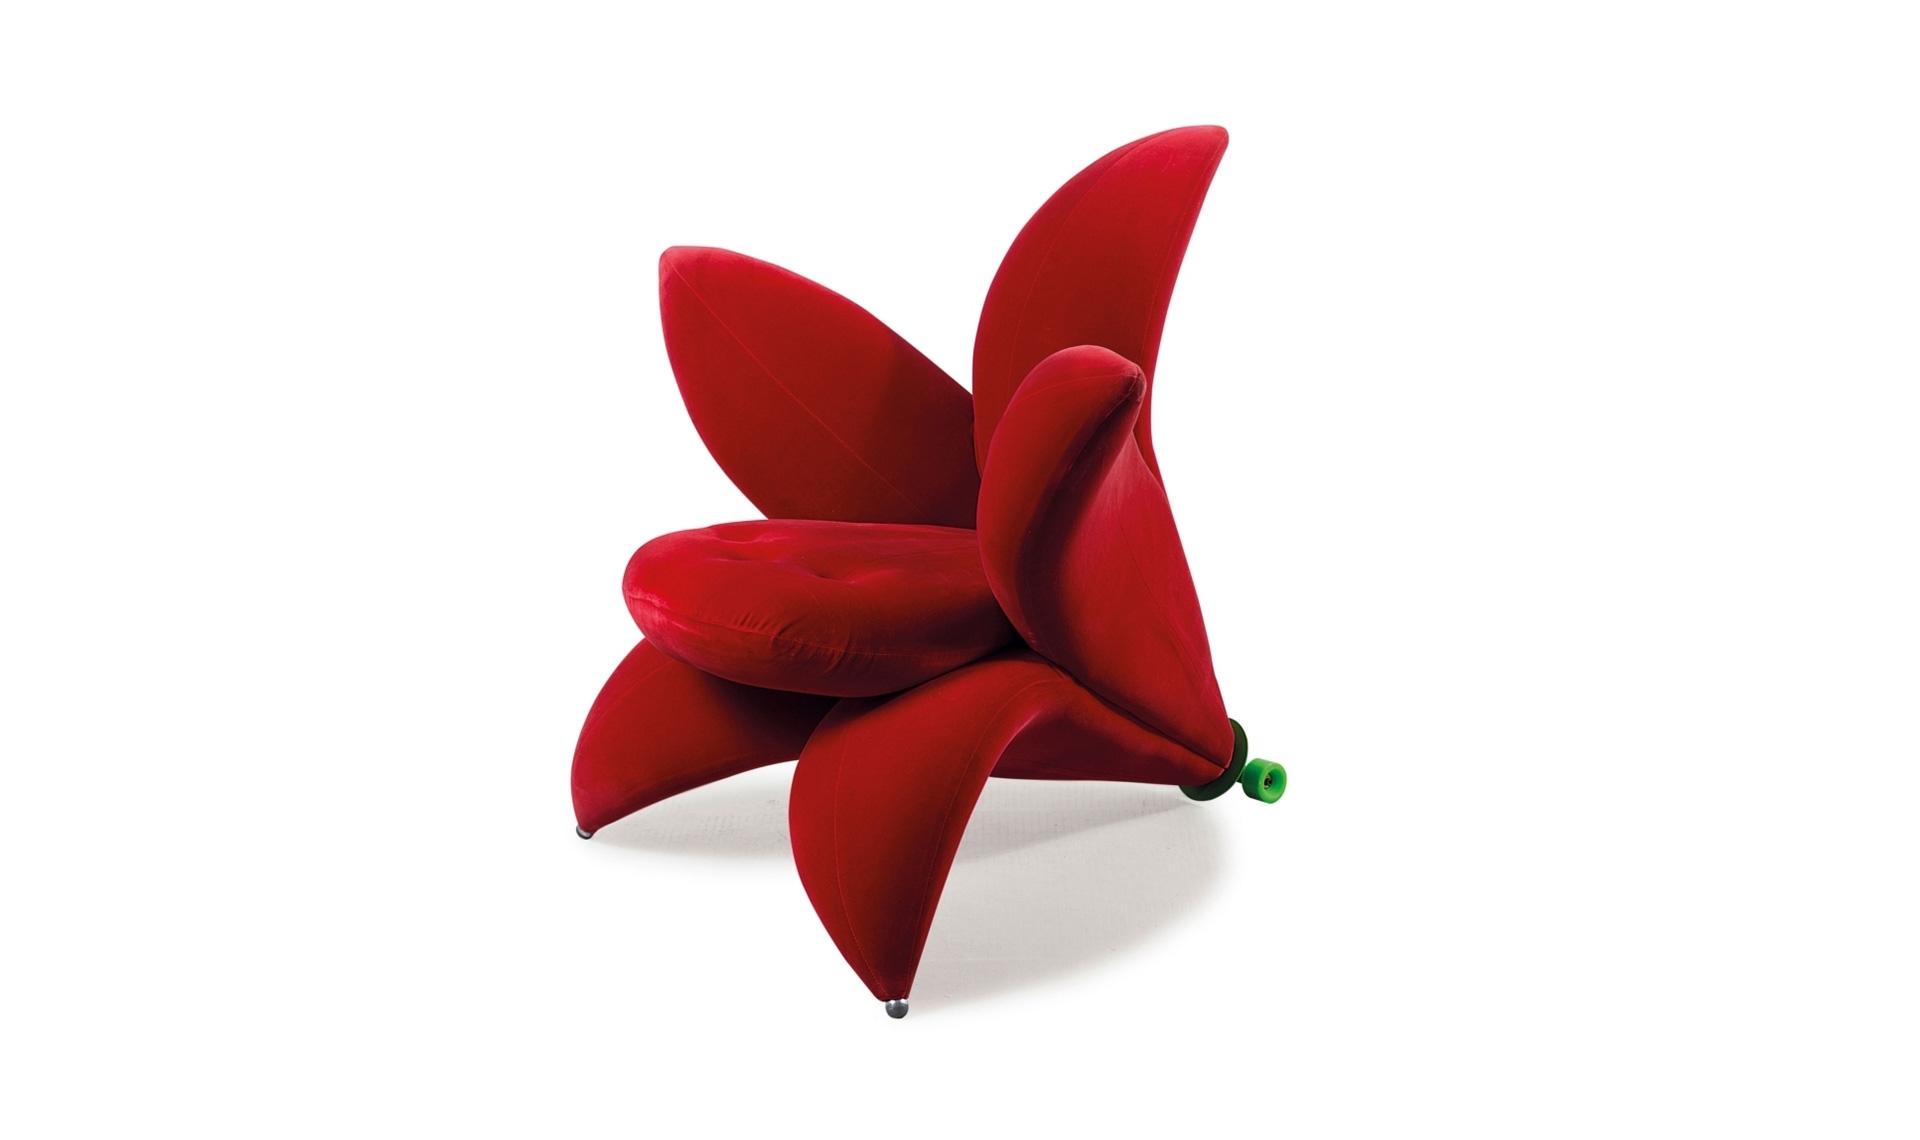 100 лет дизайна: кресло-цветок Масанори Умеды